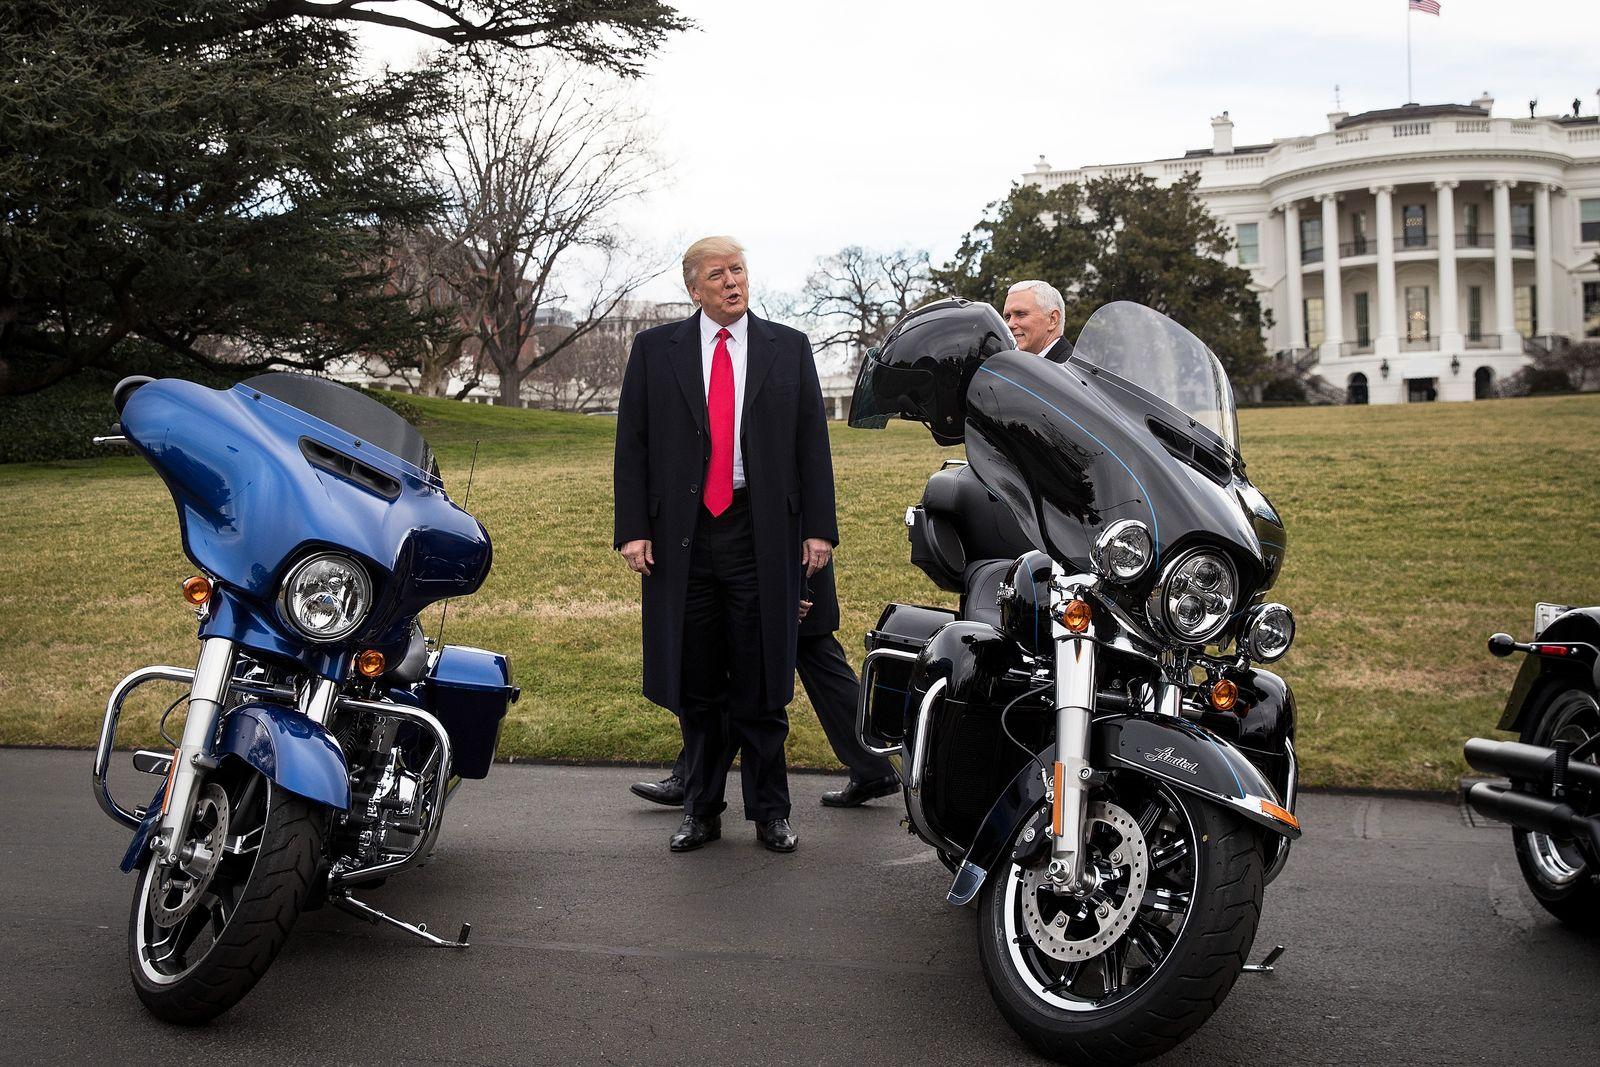 Harley Davidson / Trump